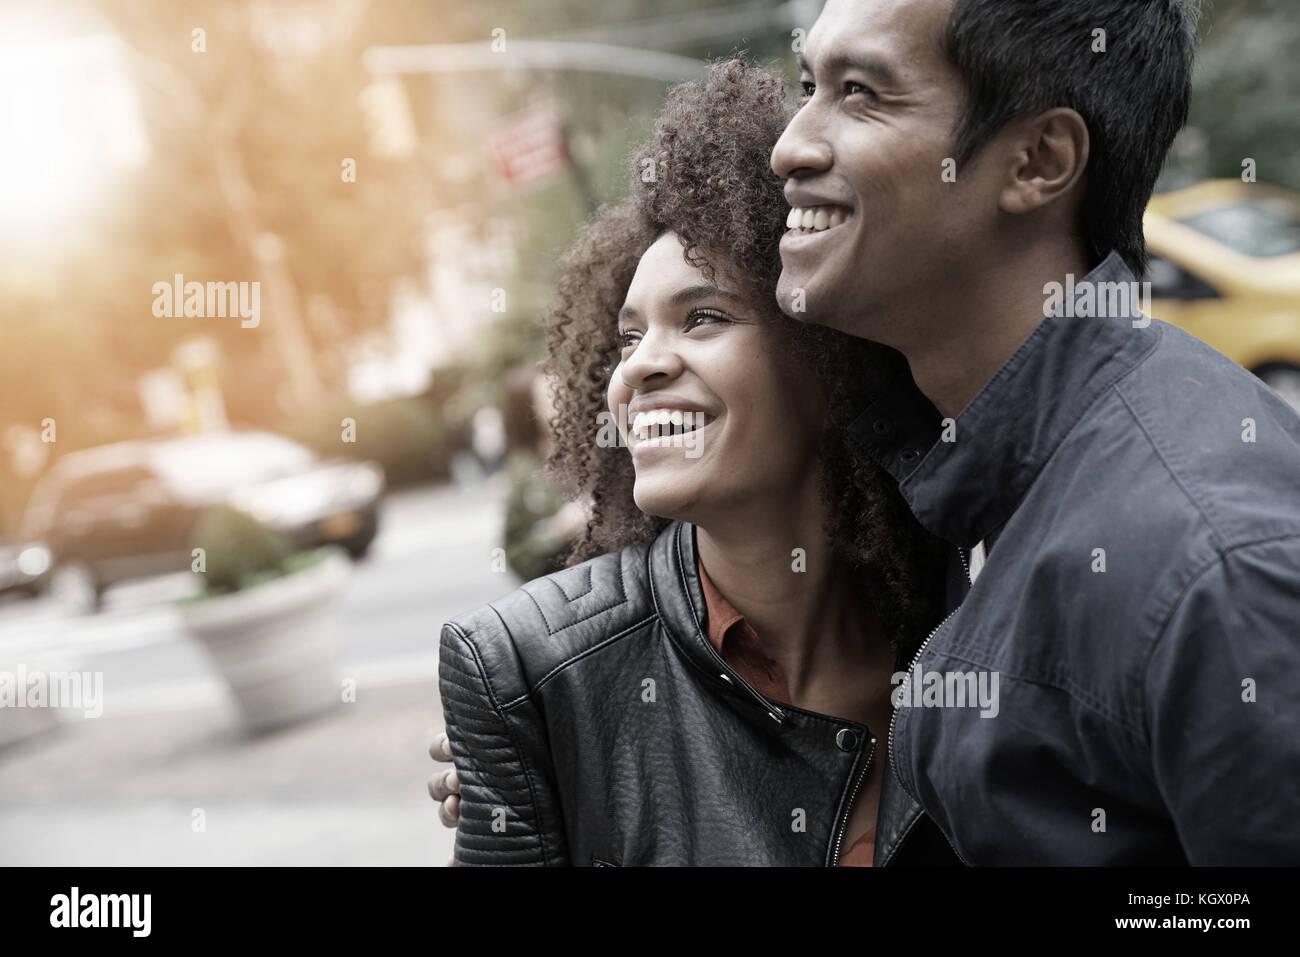 Ethnic couple walking in new york city street Photo Stock